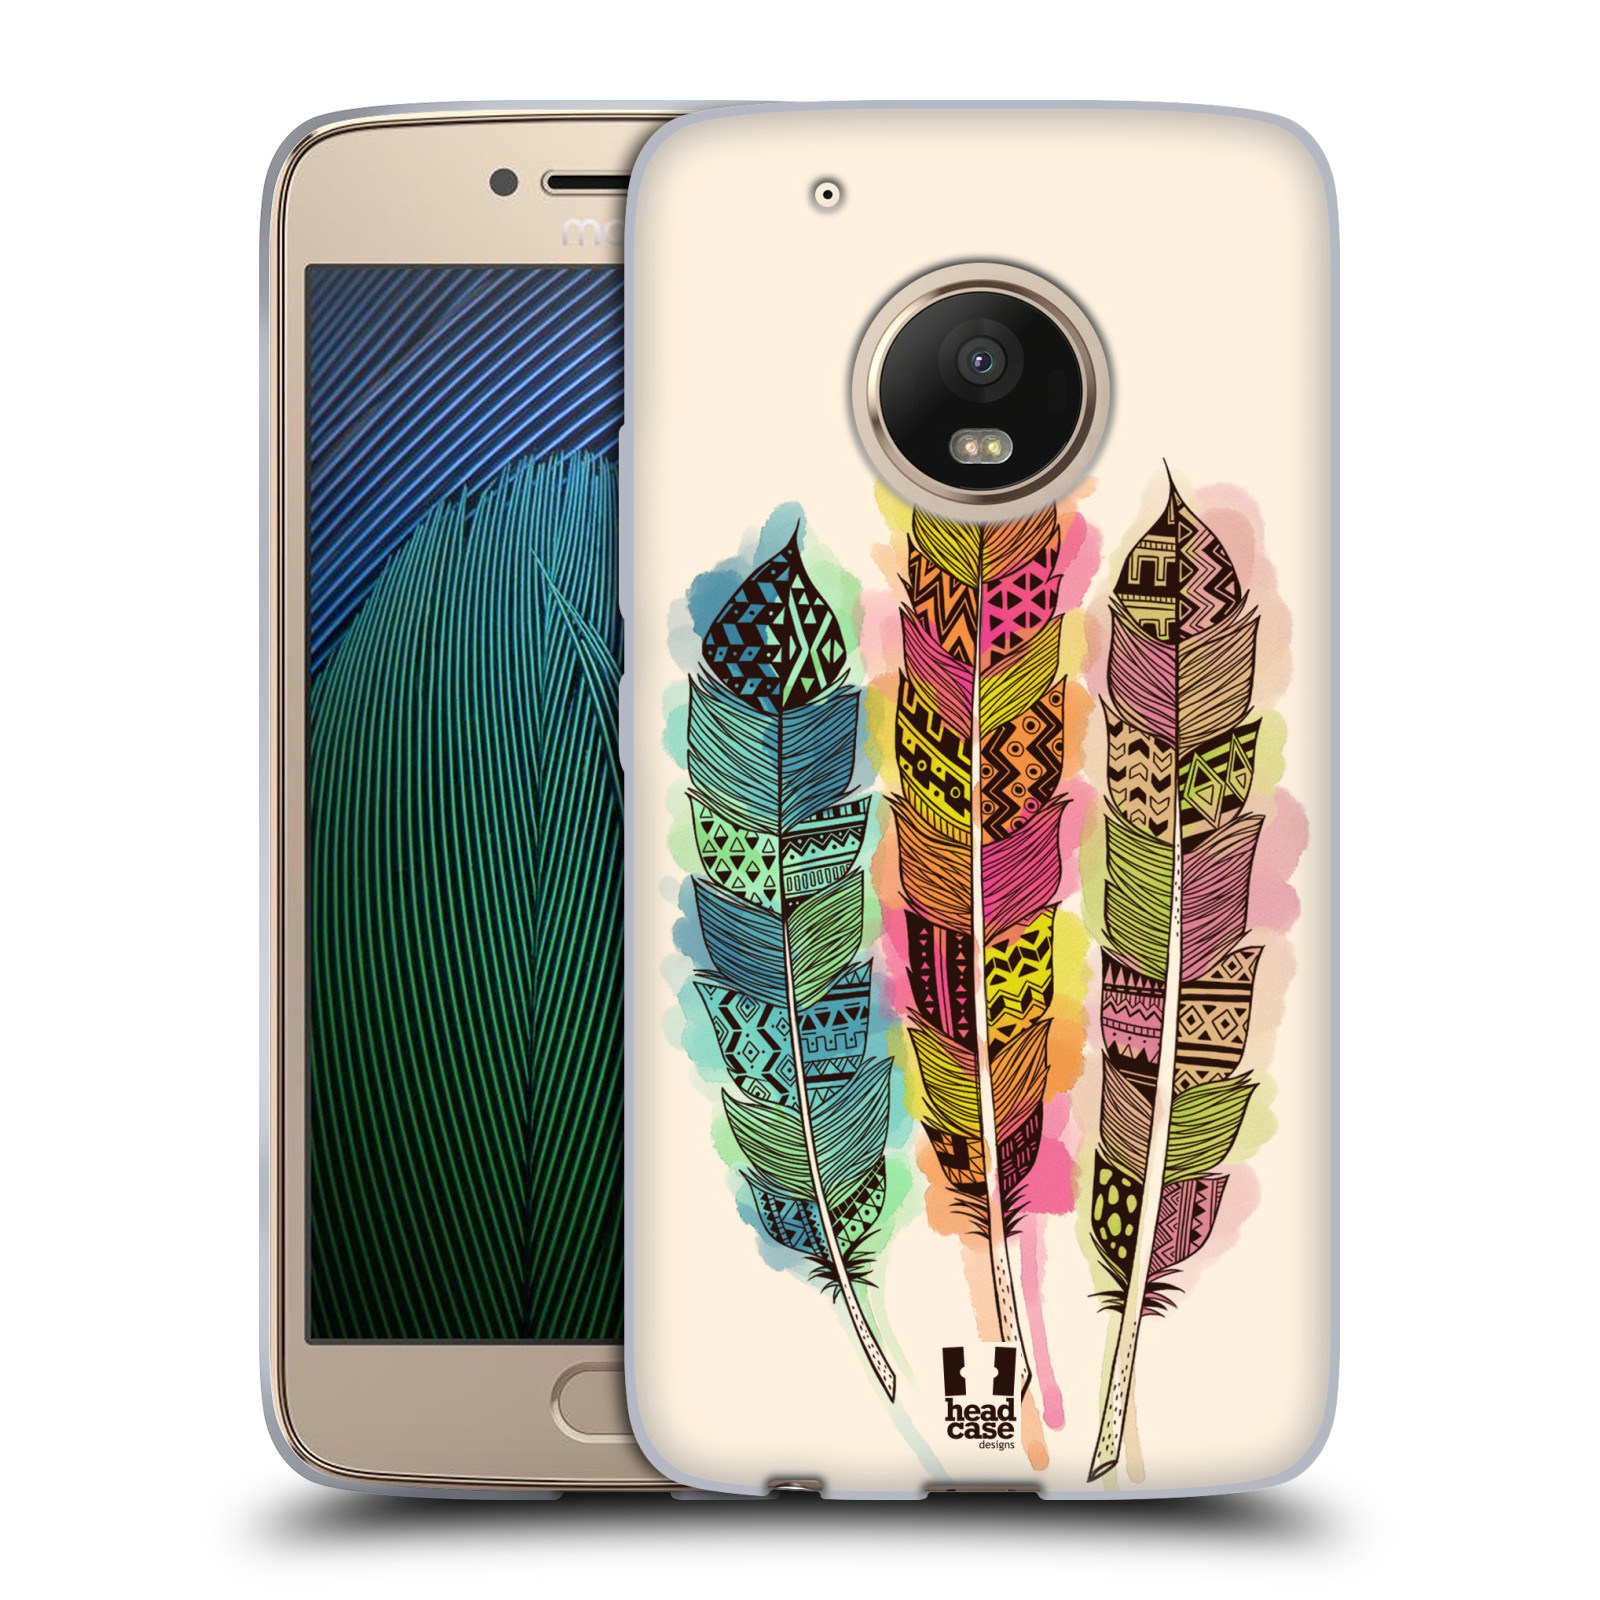 Silikonové pouzdro na mobil Lenovo Moto G5 Plus - Head Case AZTEC PÍRKA SPLASH